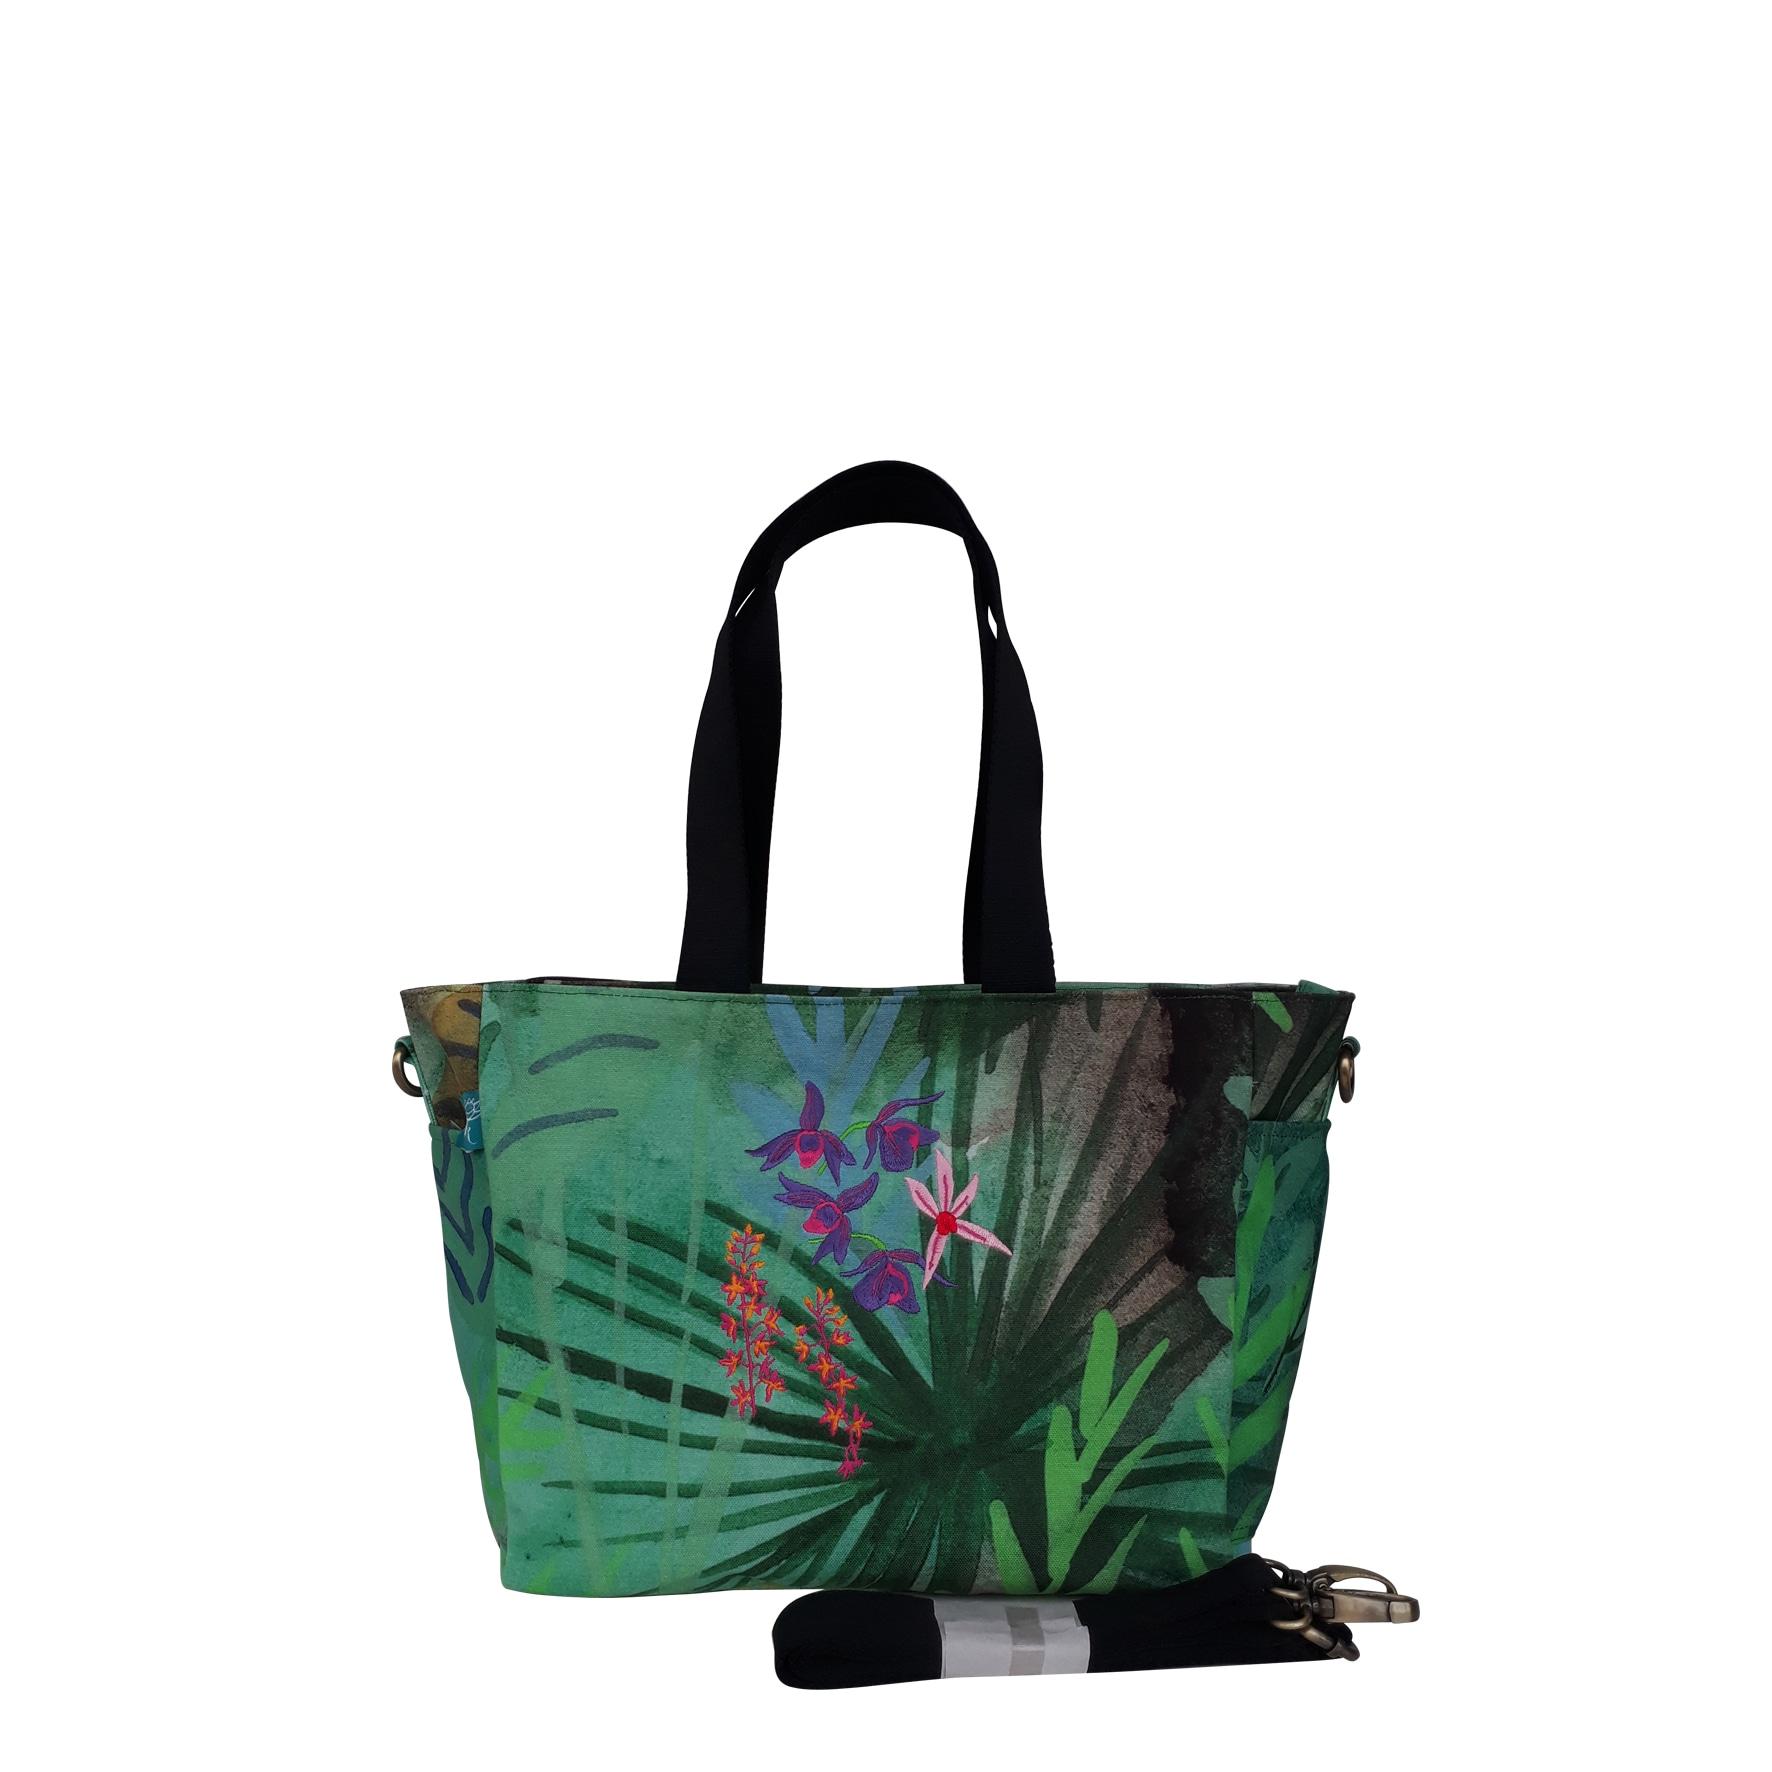 Anggrek Hutan Jhonny Bag Sling